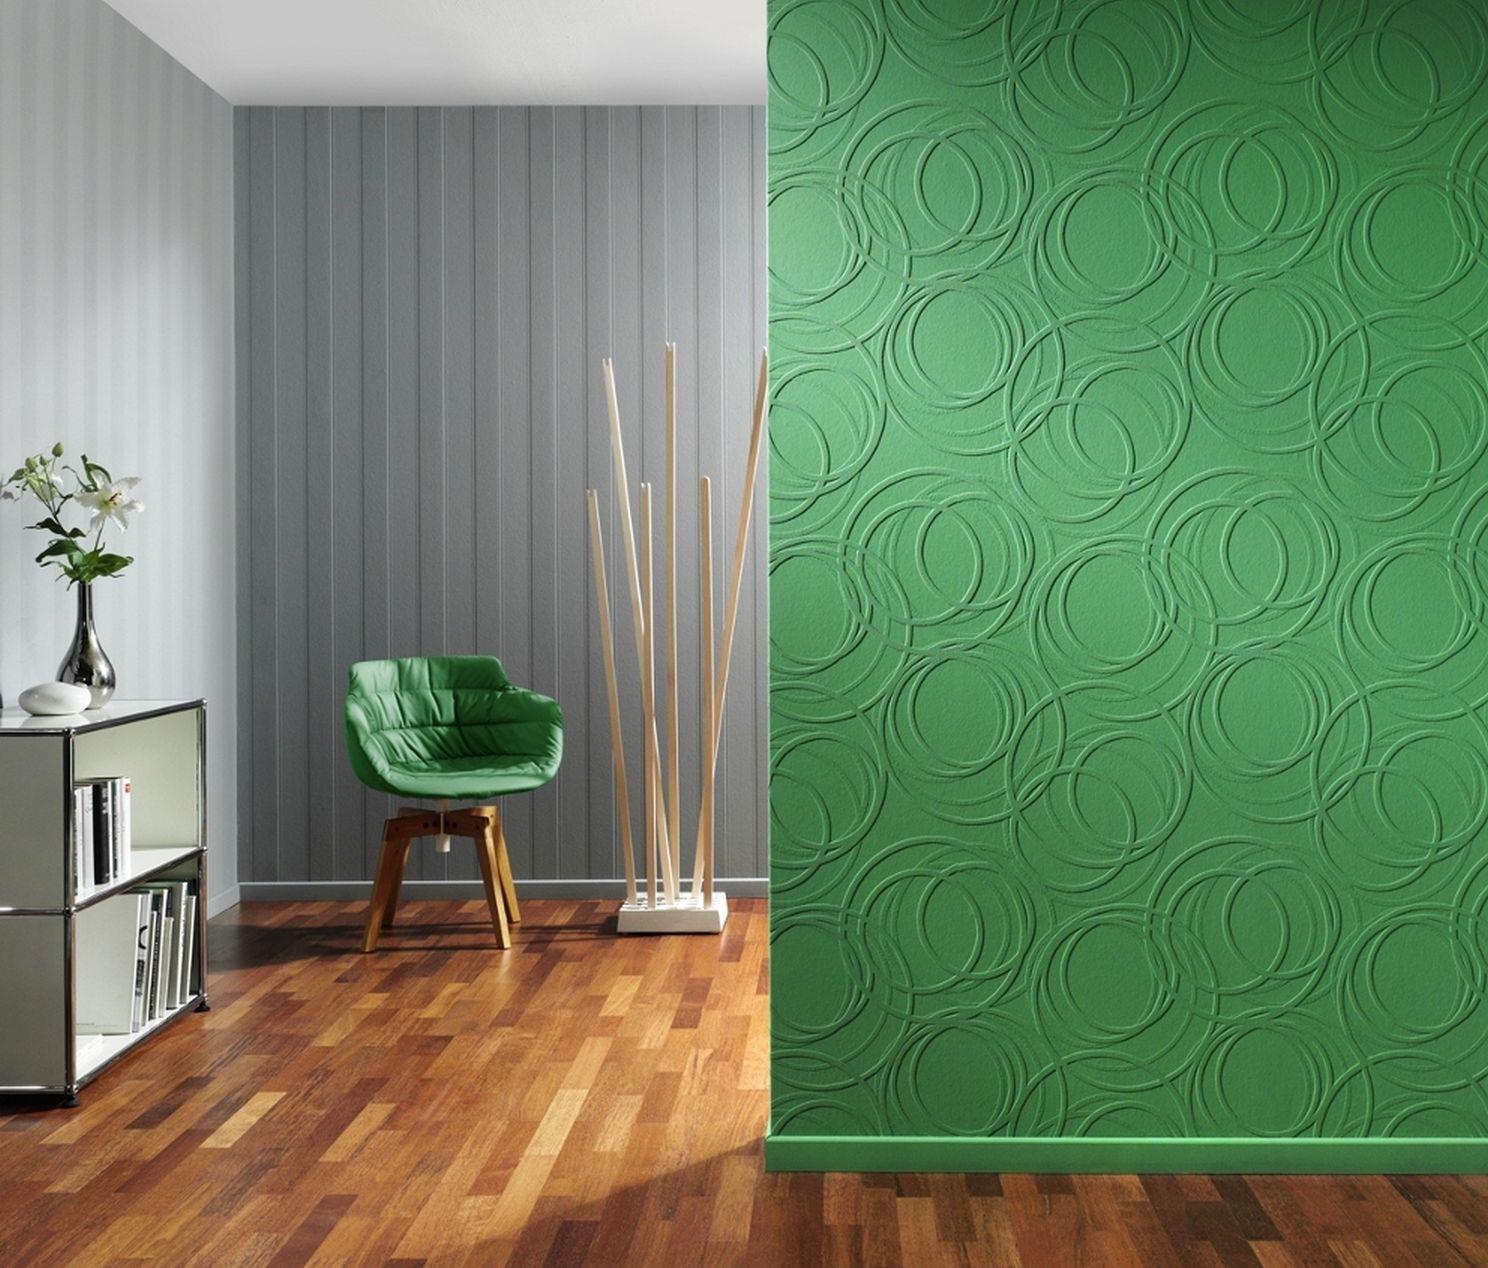 vlies tapete berstreichbar kringel rasch 342208. Black Bedroom Furniture Sets. Home Design Ideas